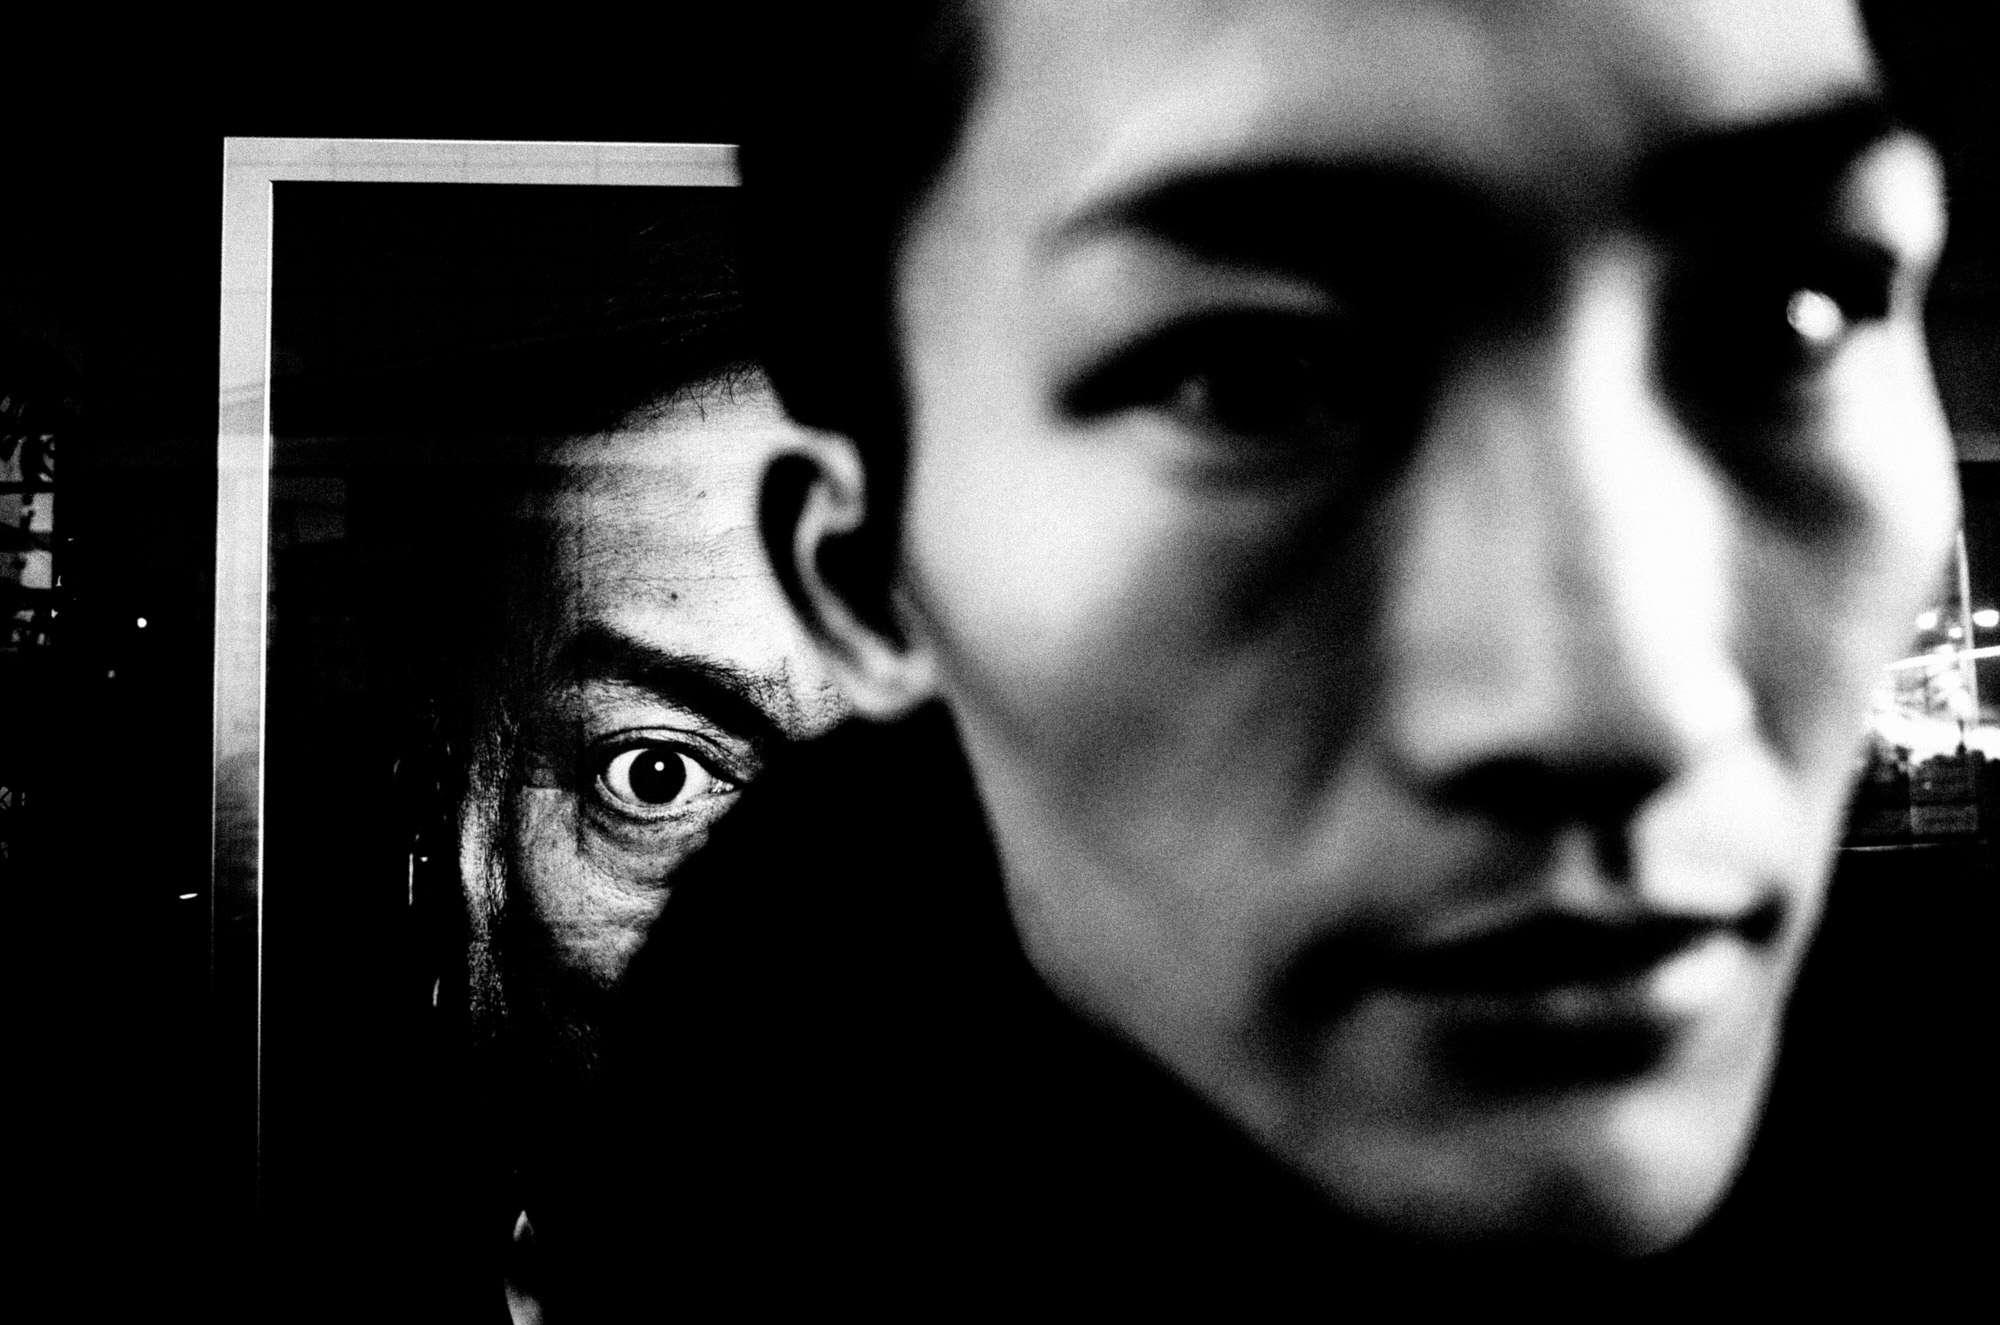 tokyo-eye-eric-kim-street-photography-contact-sheet-0000545